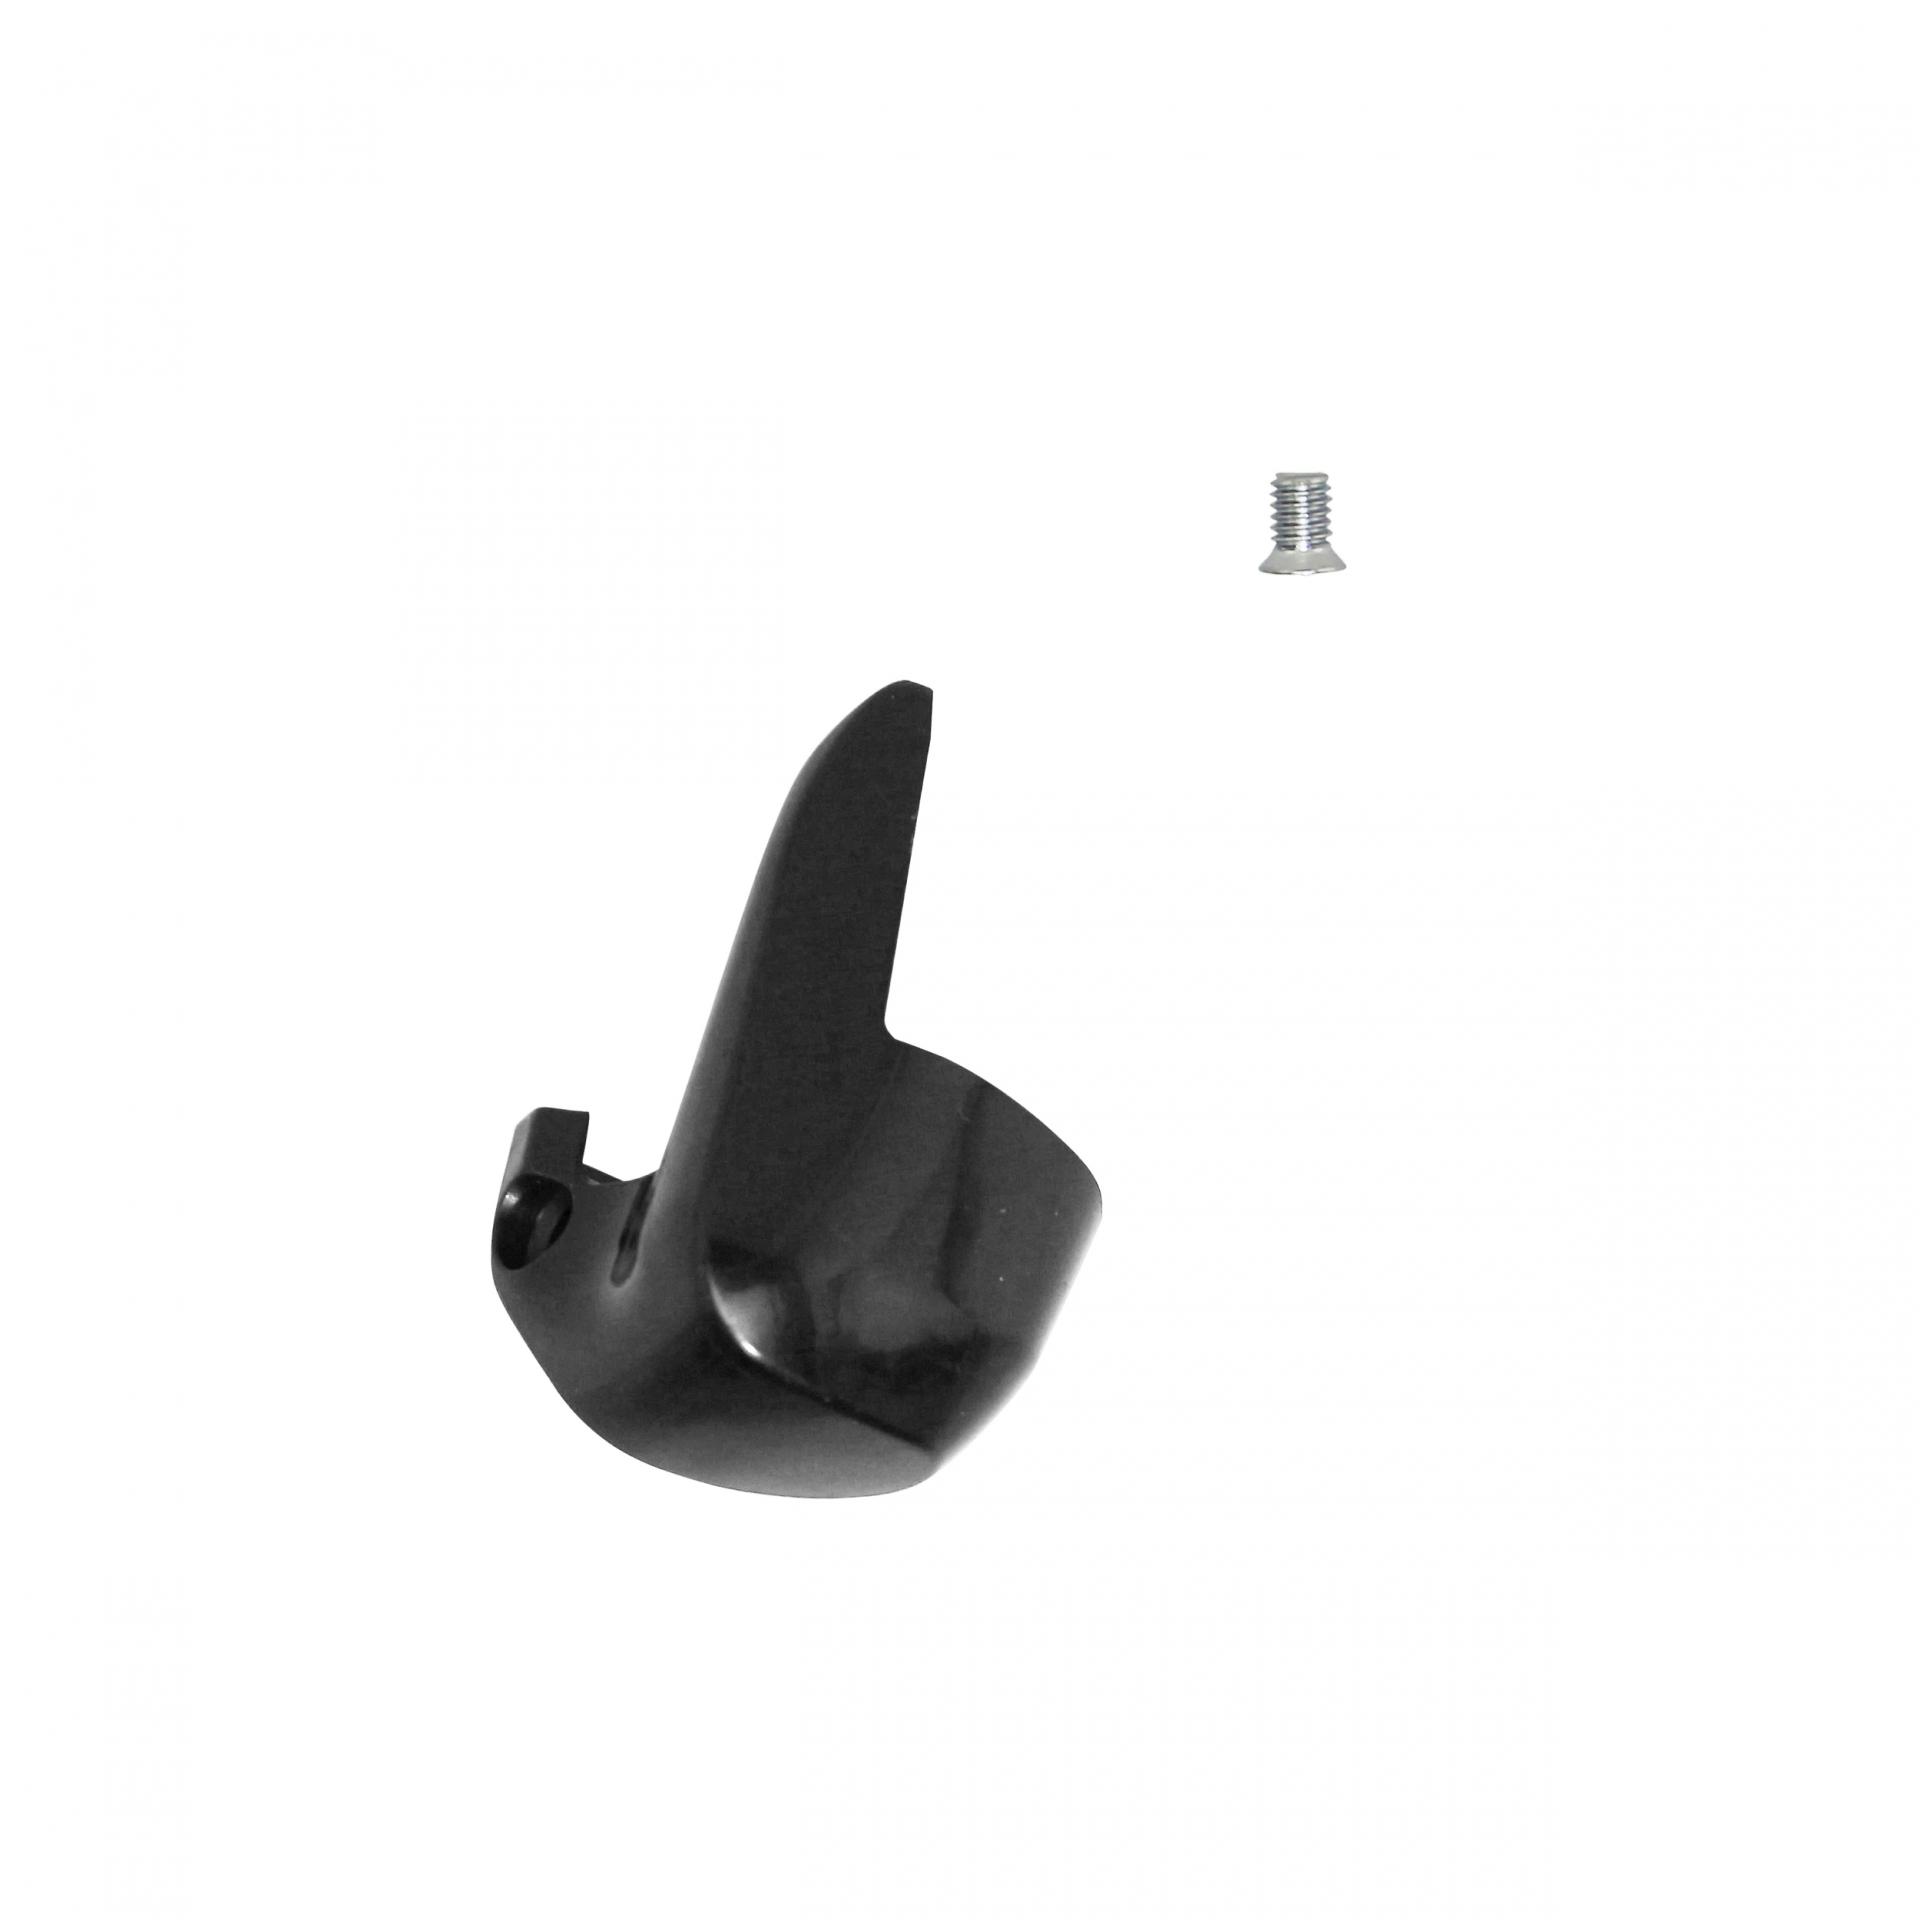 Capot frontal manette Shimano 105 R7020 Hydraulique 11V Droit